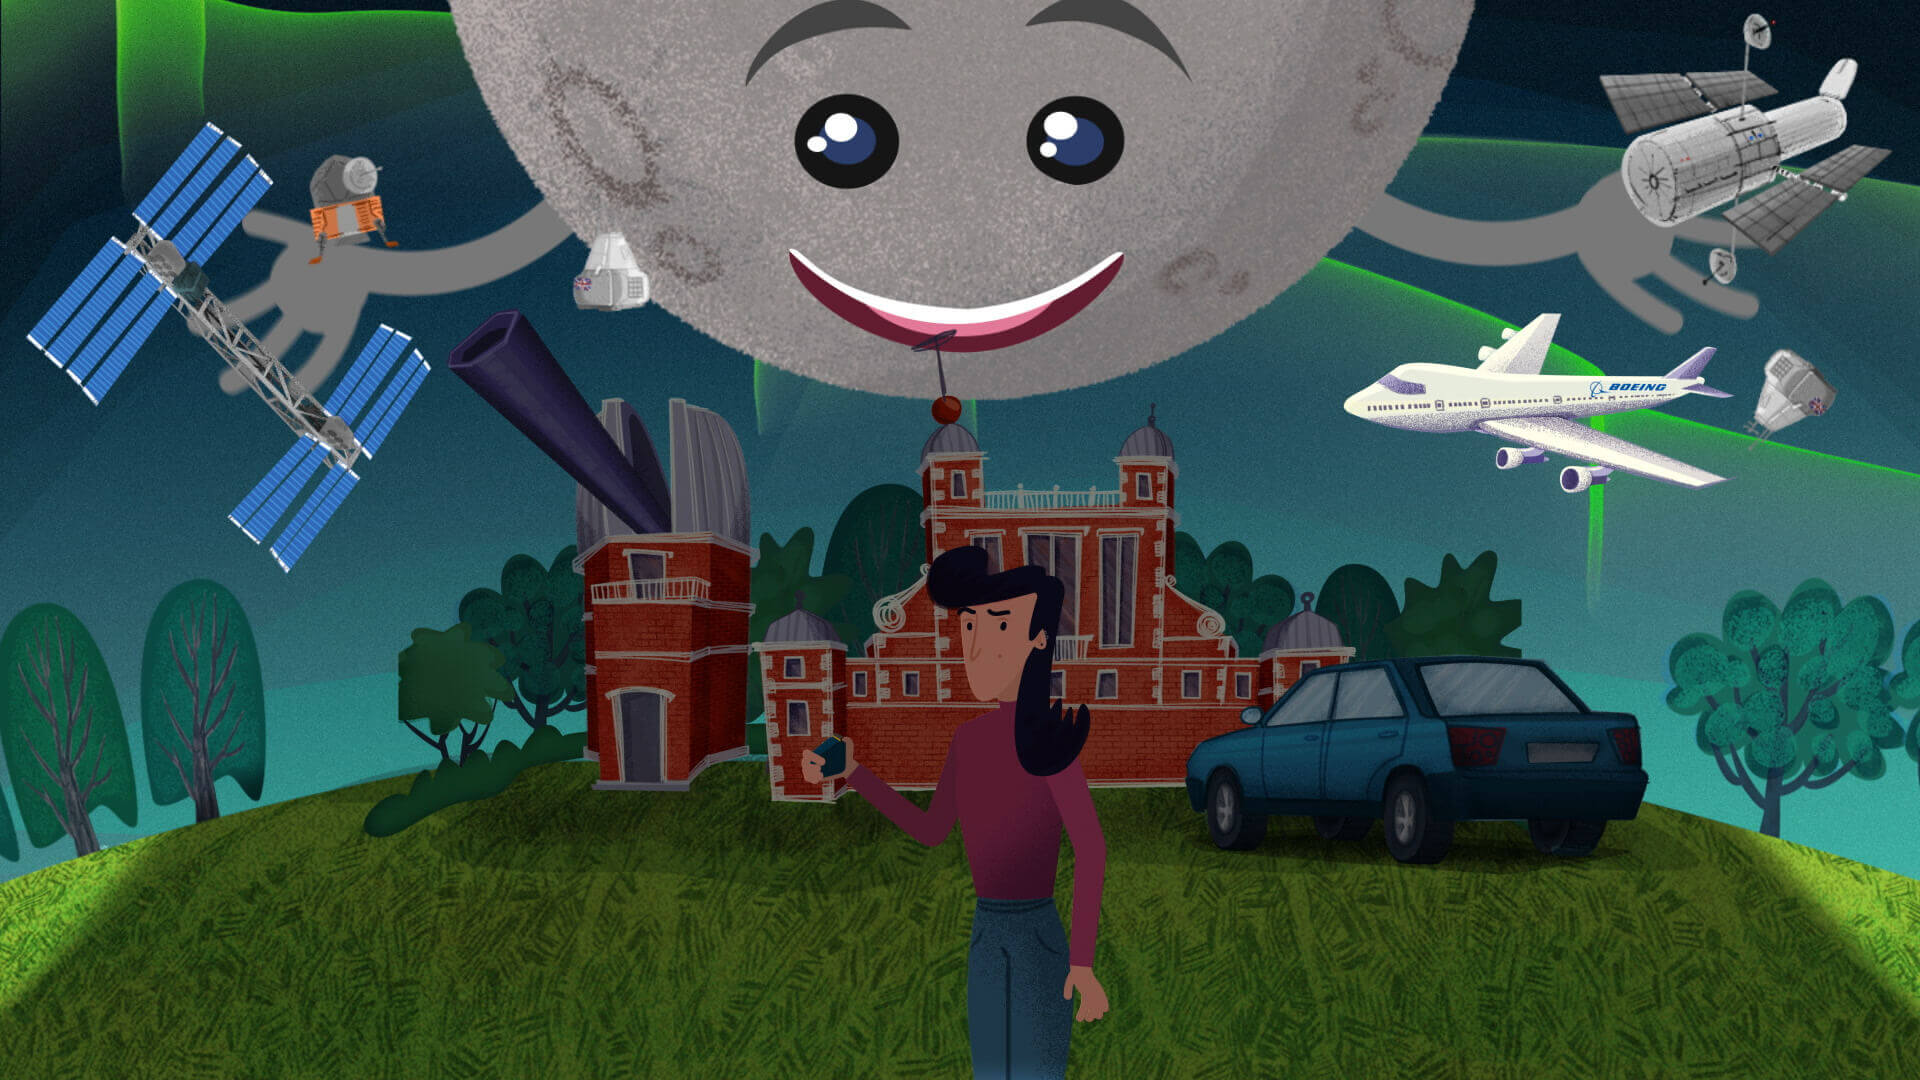 Photo of Slurpy Studios' animation work space